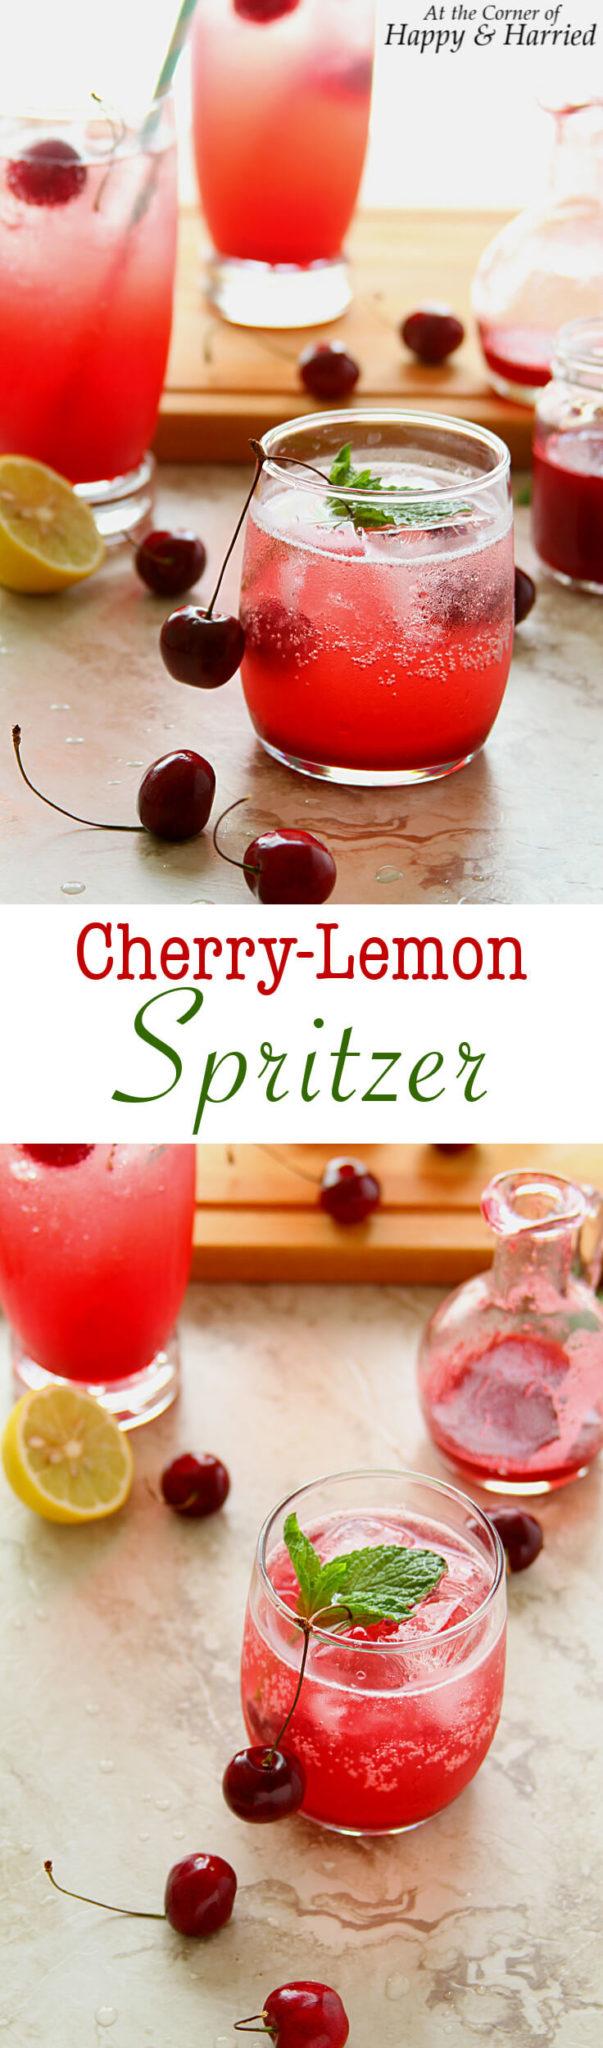 CHERRY LEMON SPRITZER - HAPPY&HARRIED